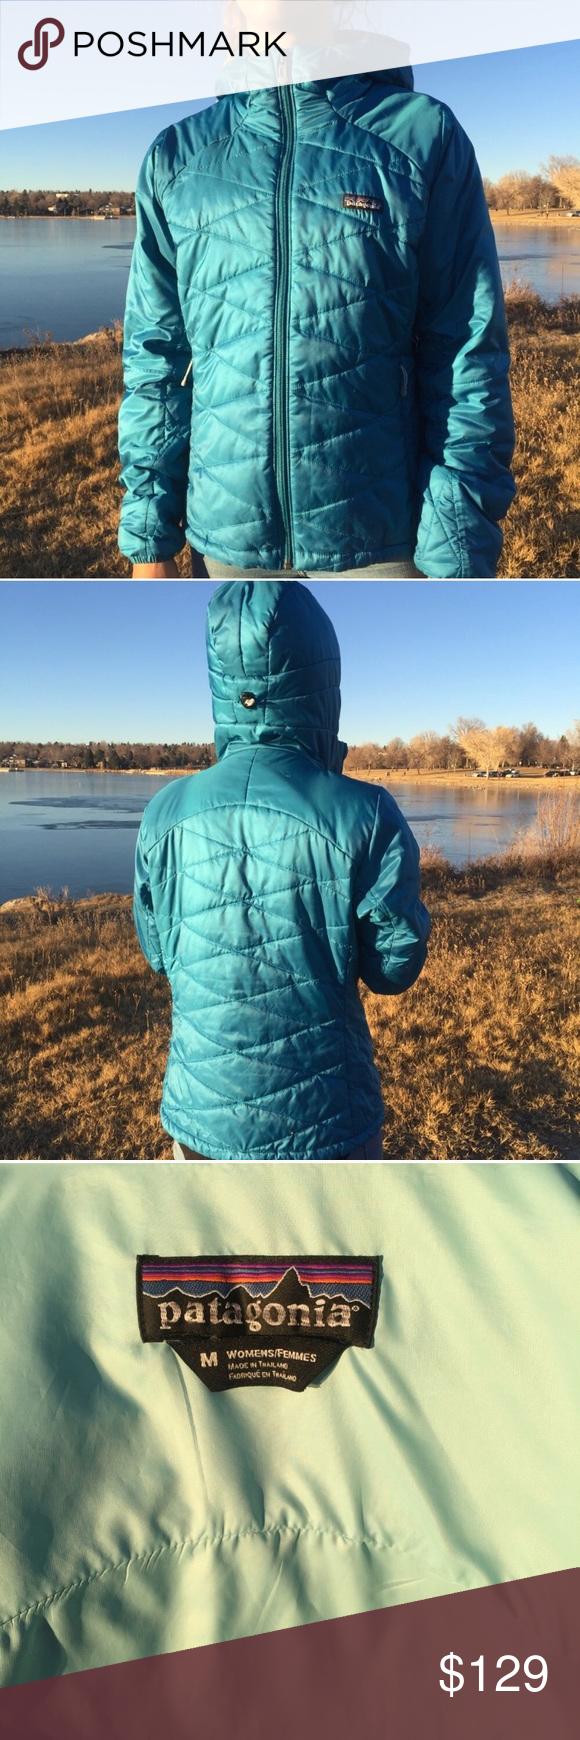 Patagonia Nano Puff Jacket Excellent Condition Primaloft